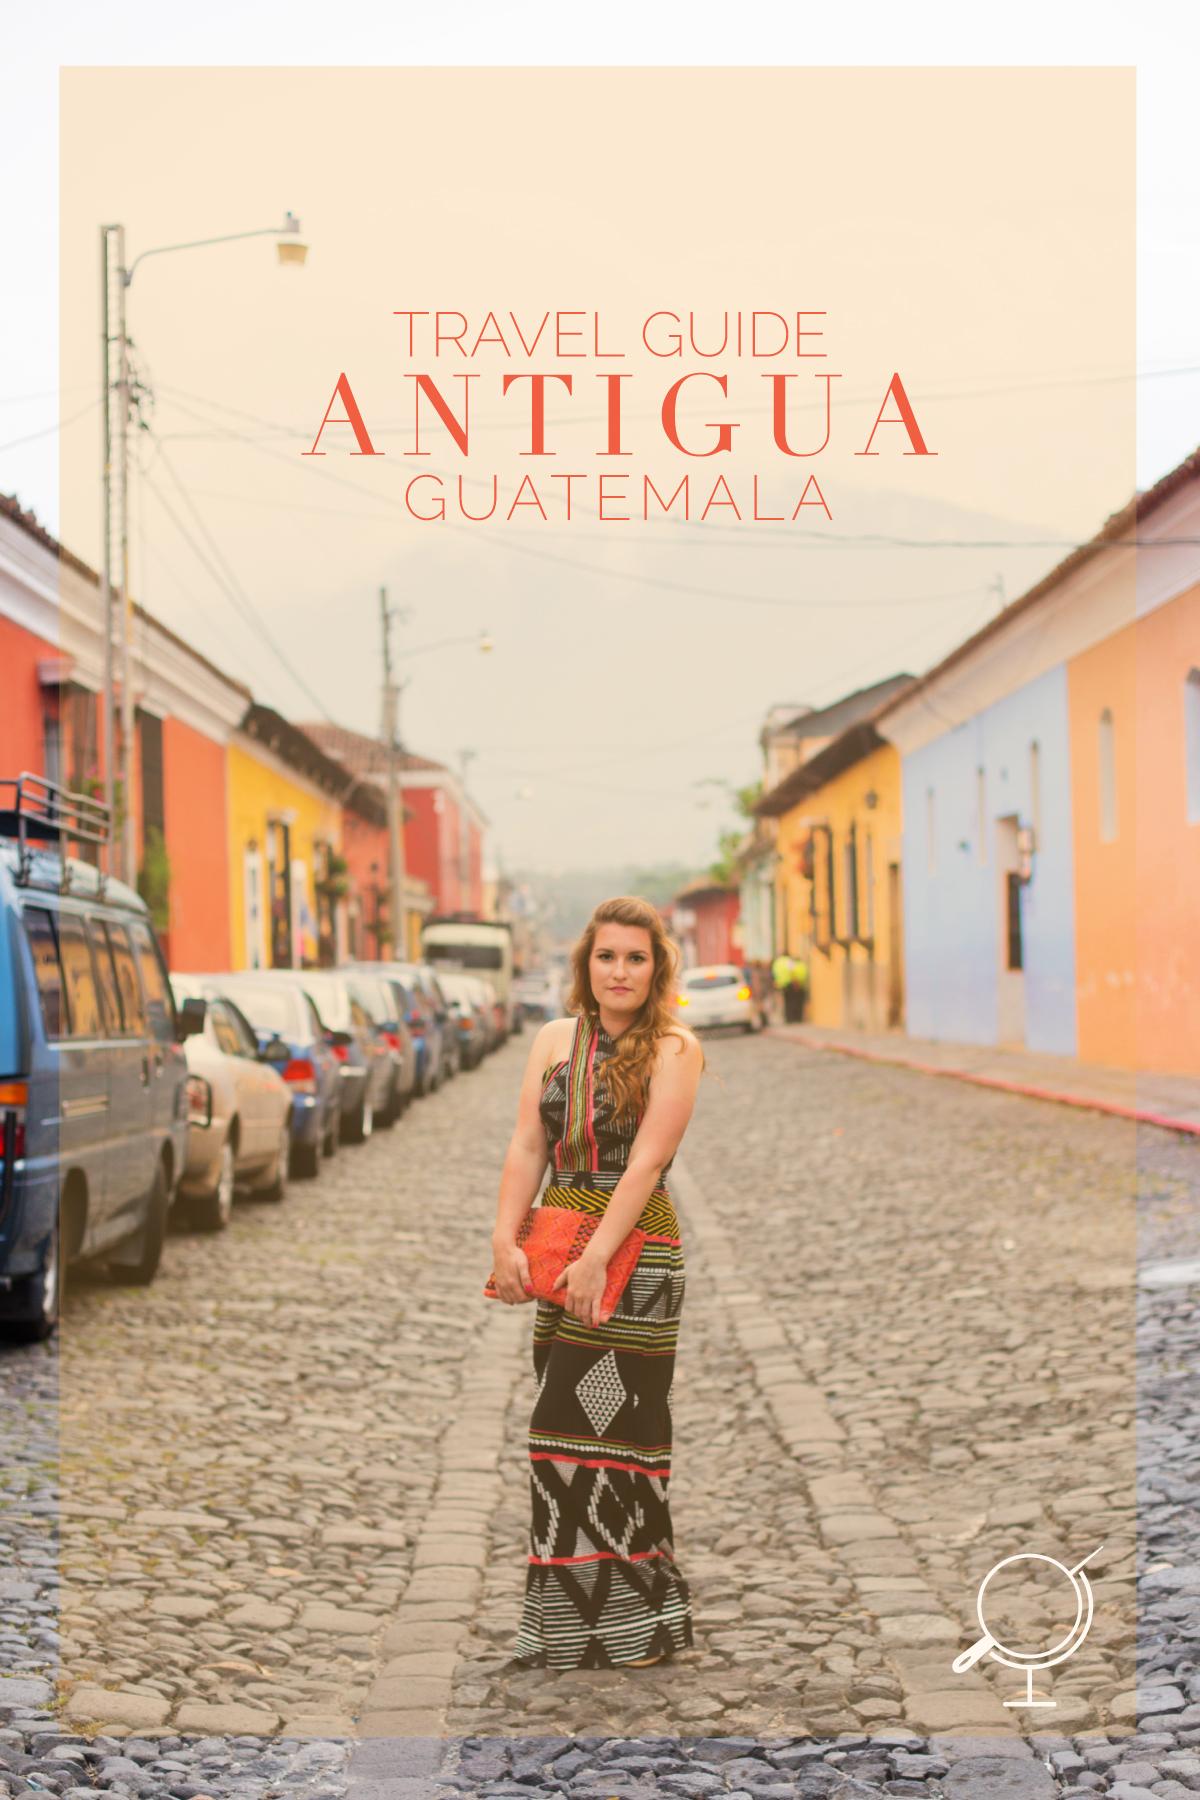 Travel Guide Antigua Guatemala